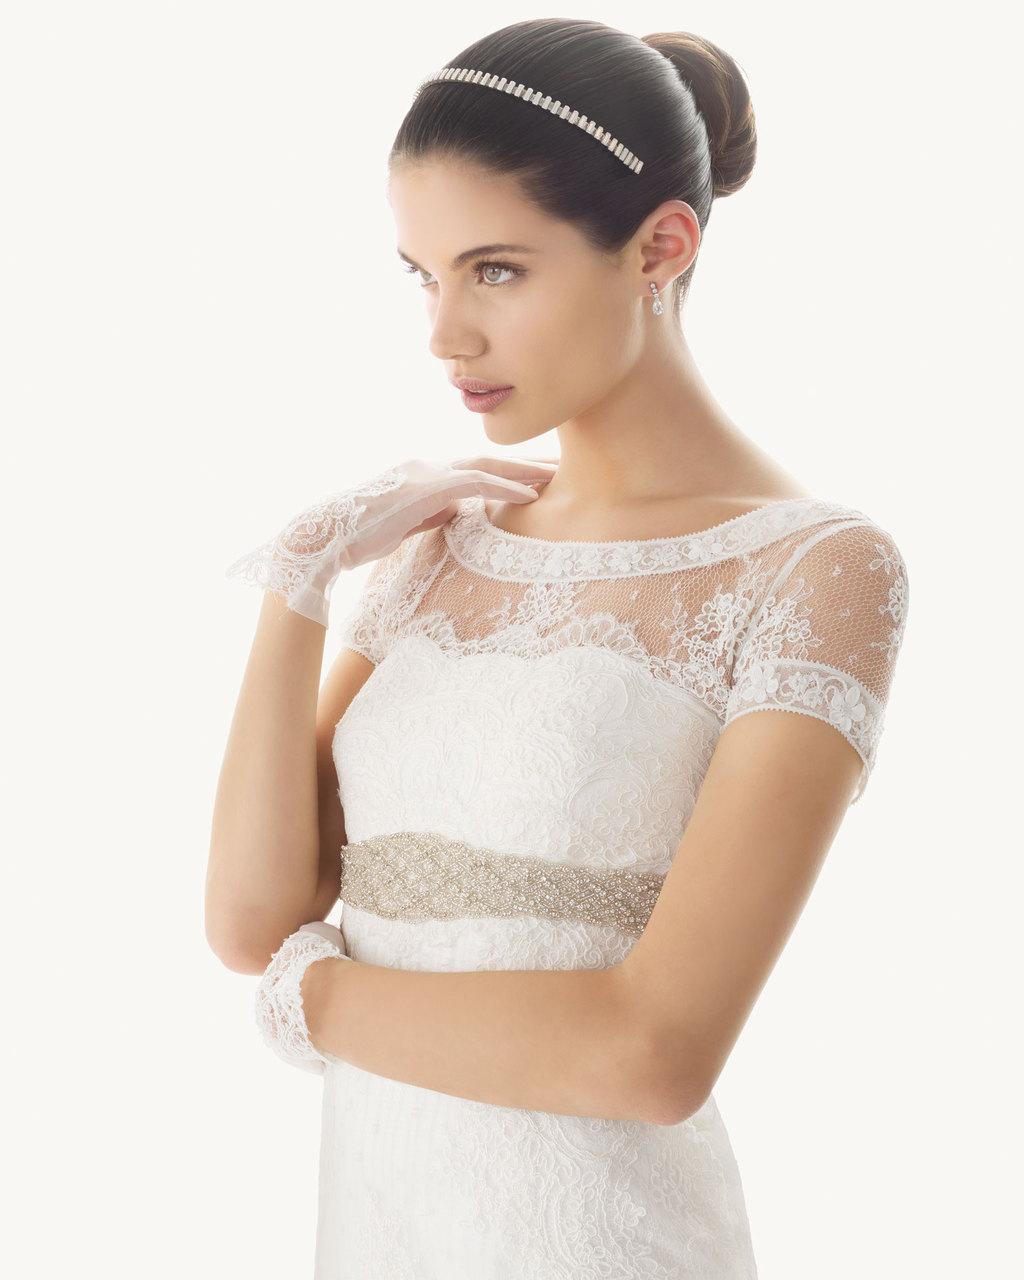 Transforming-wedding-dresses-2013-bridal-gown-by-rosa-clara-13.full